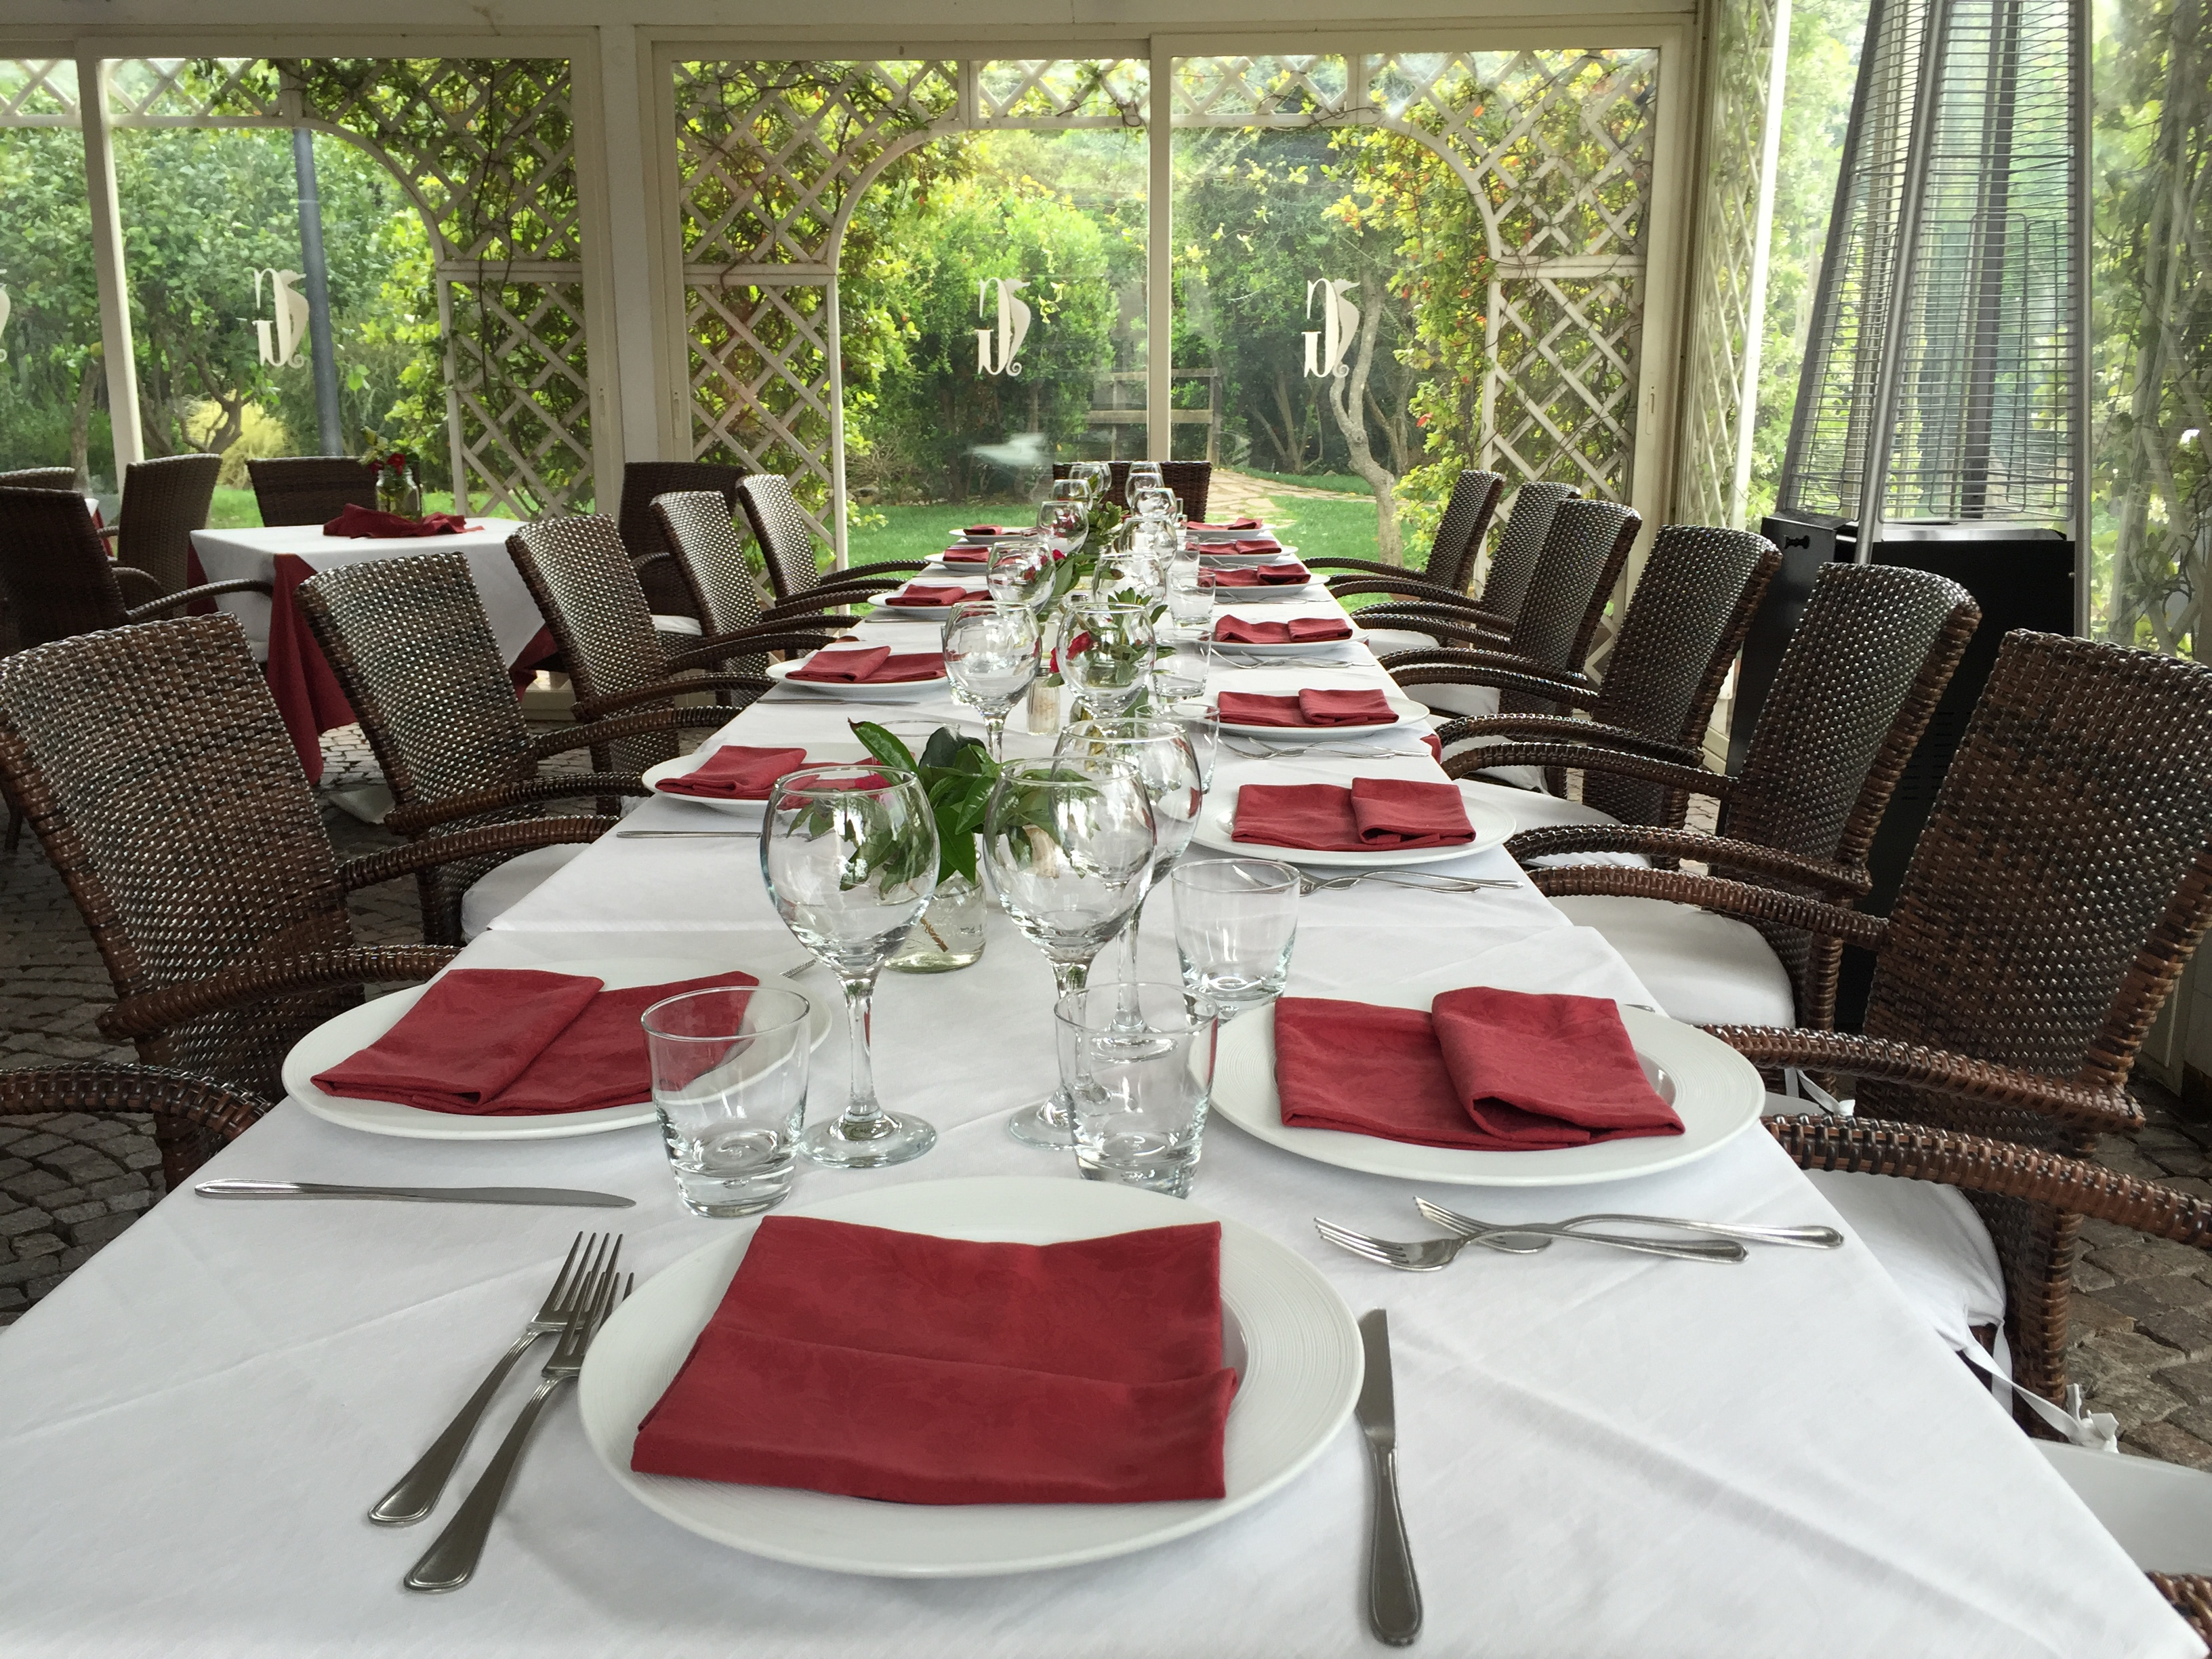 Lunch at SaMesa Restaurant in Geo Village | Olbia, Sardinia | BrowsingItaly.com